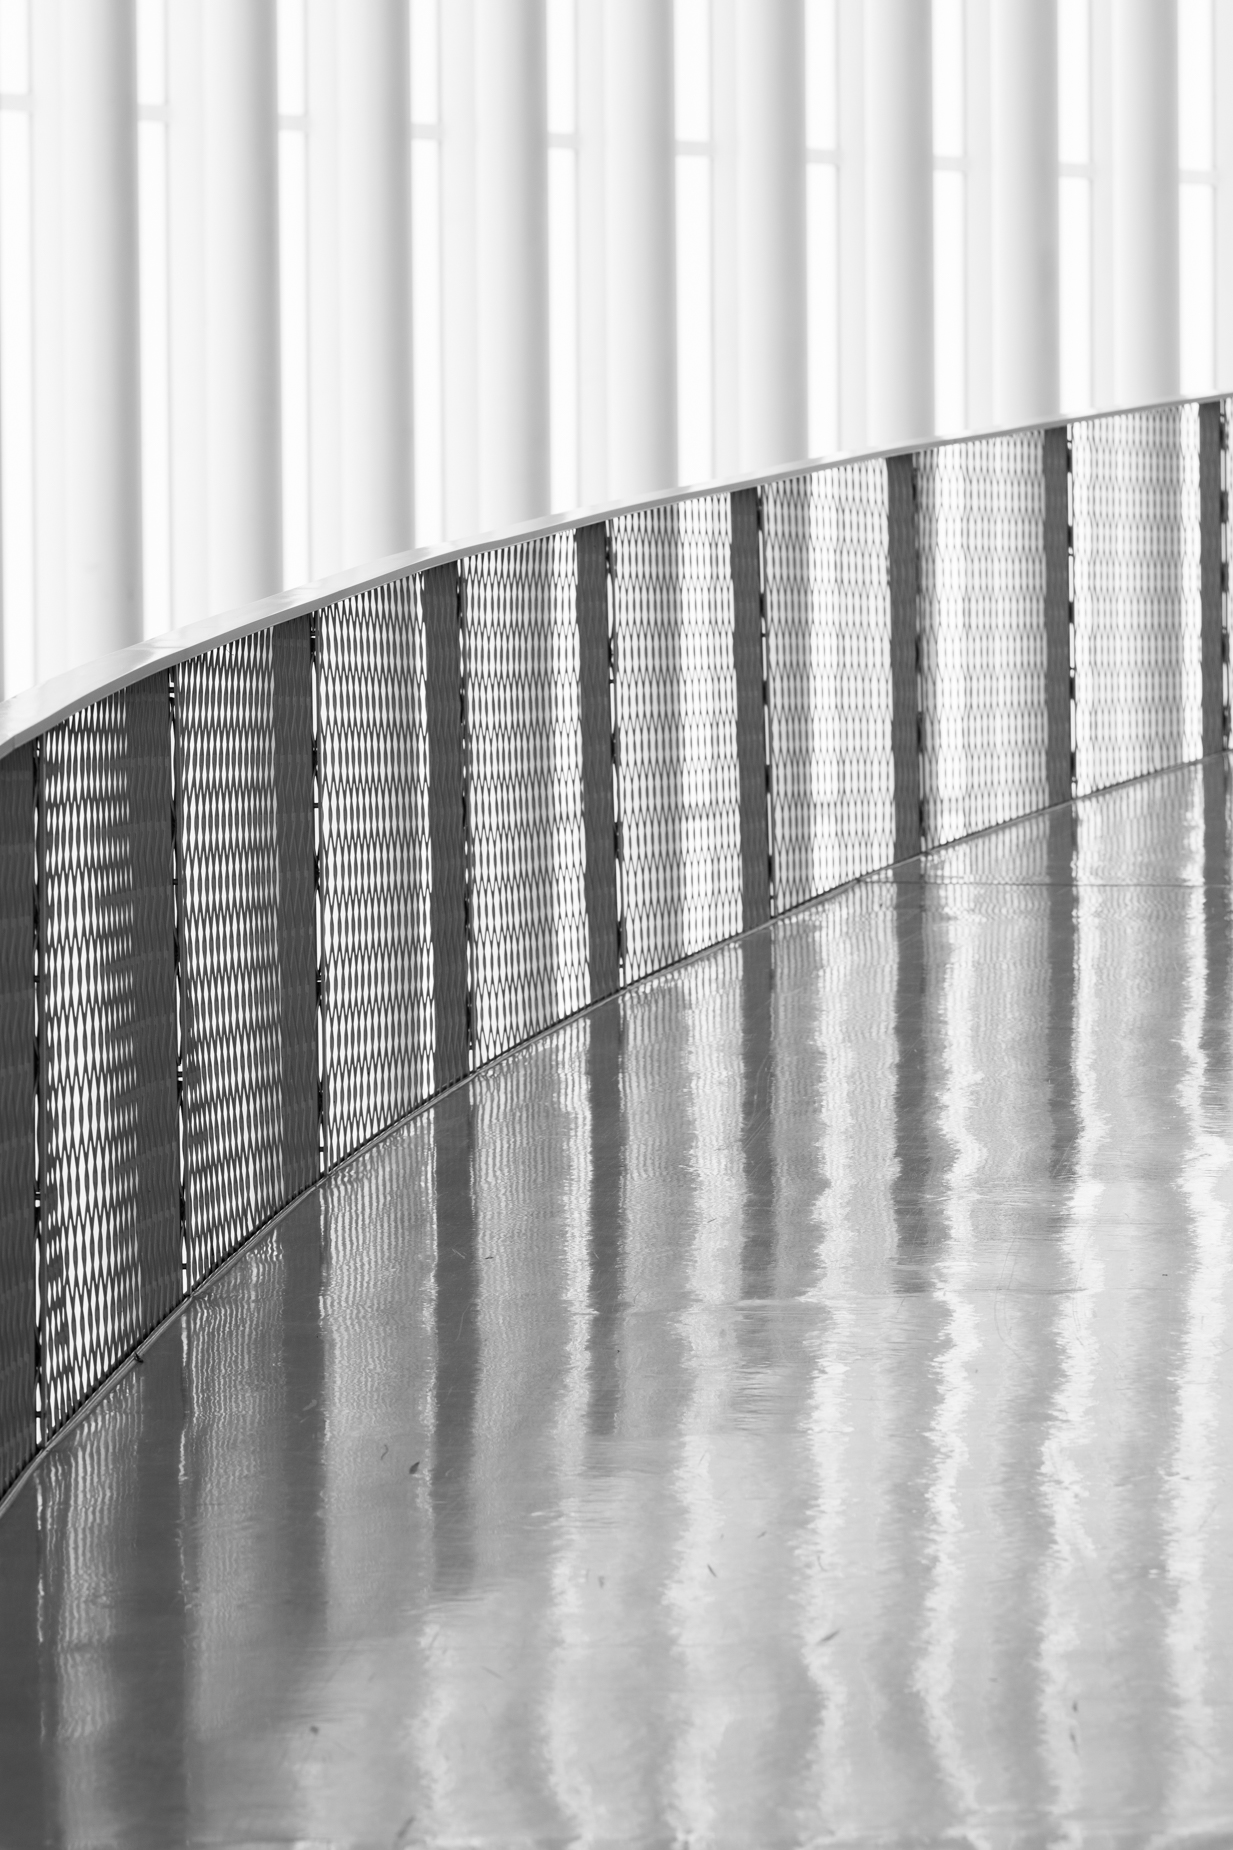 Philharmonie architecture-6.jpg